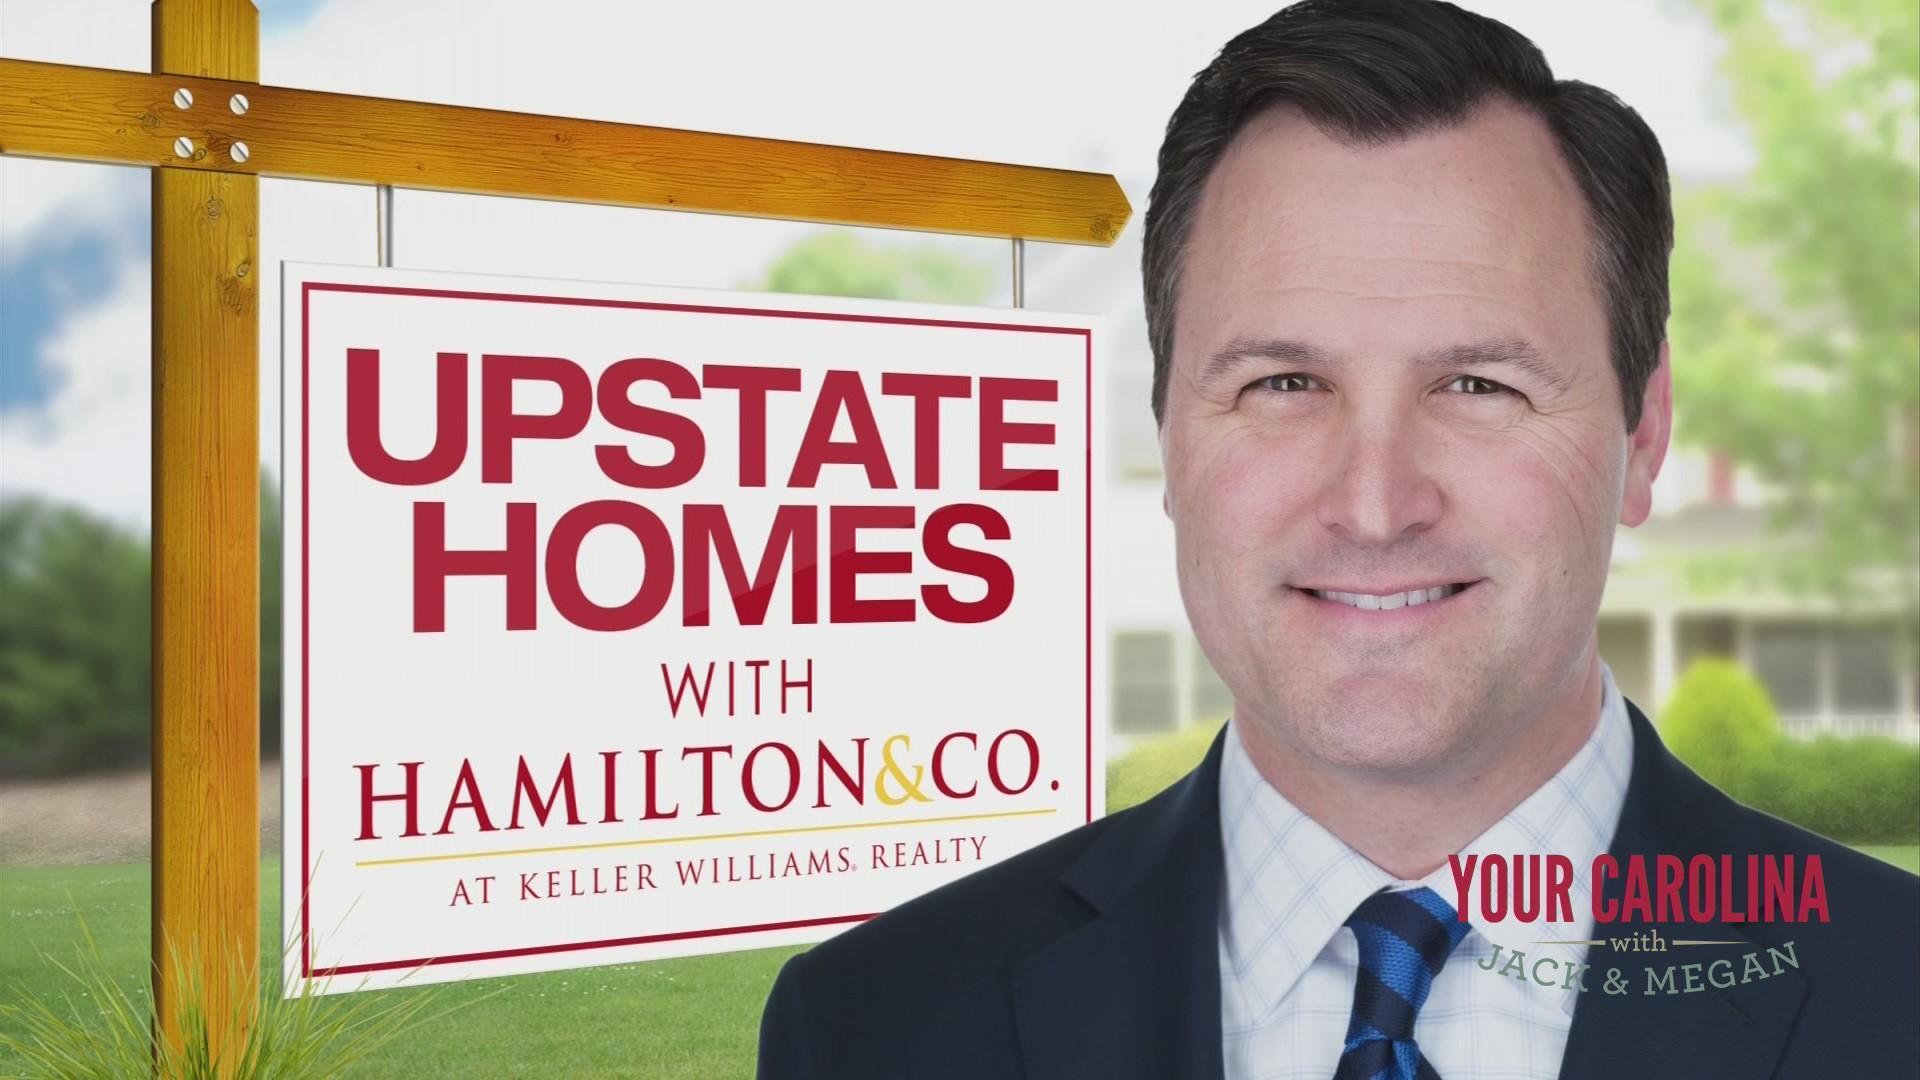 Upstate Homes - Listings August 9, 2019